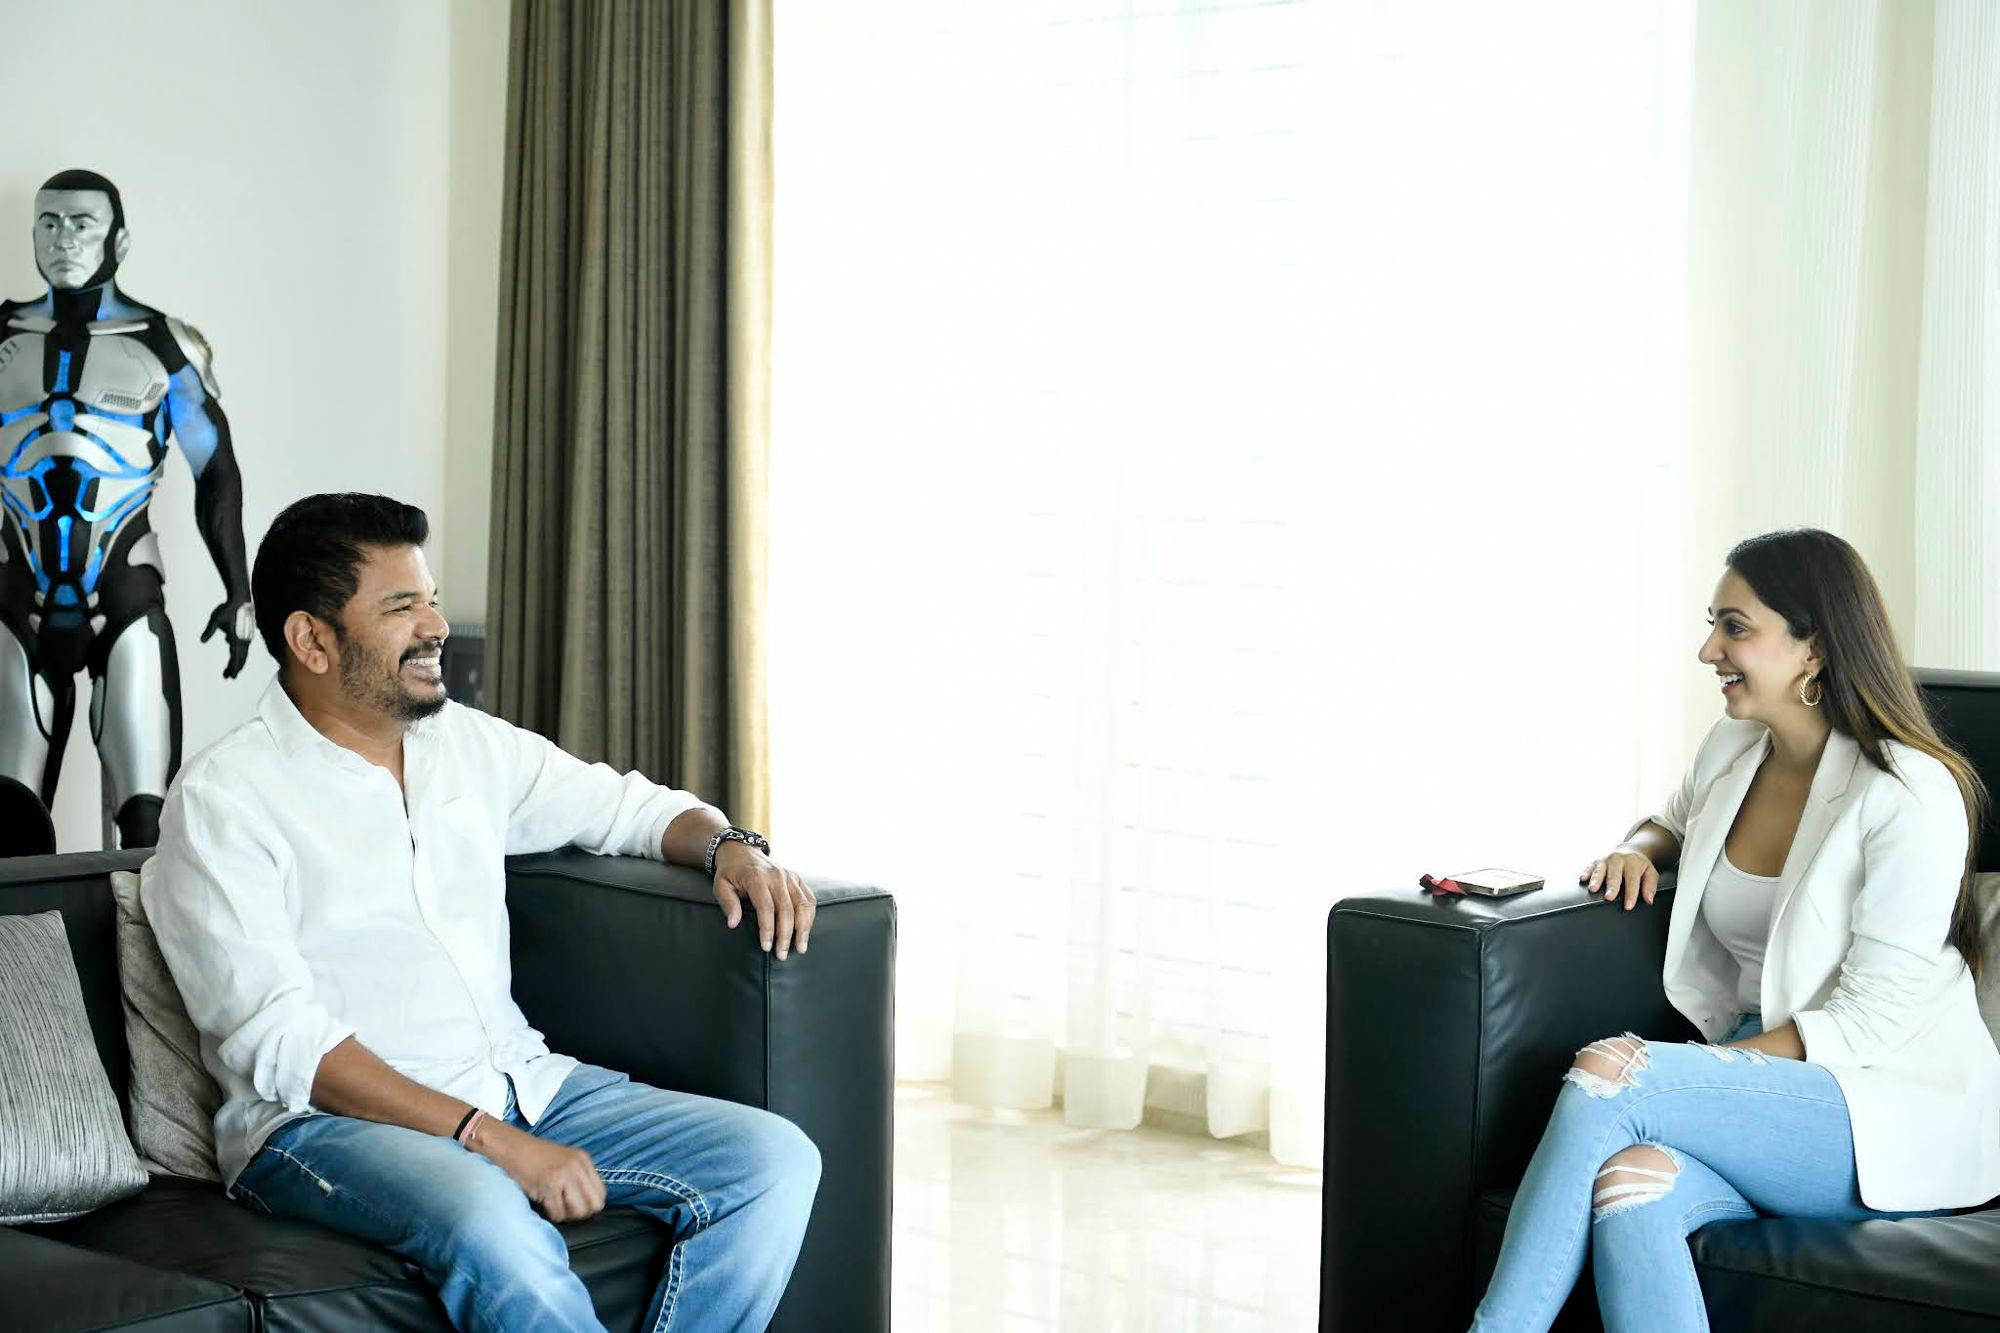 Kiara Advani joins the Director Shankar, Ram Charan Movie